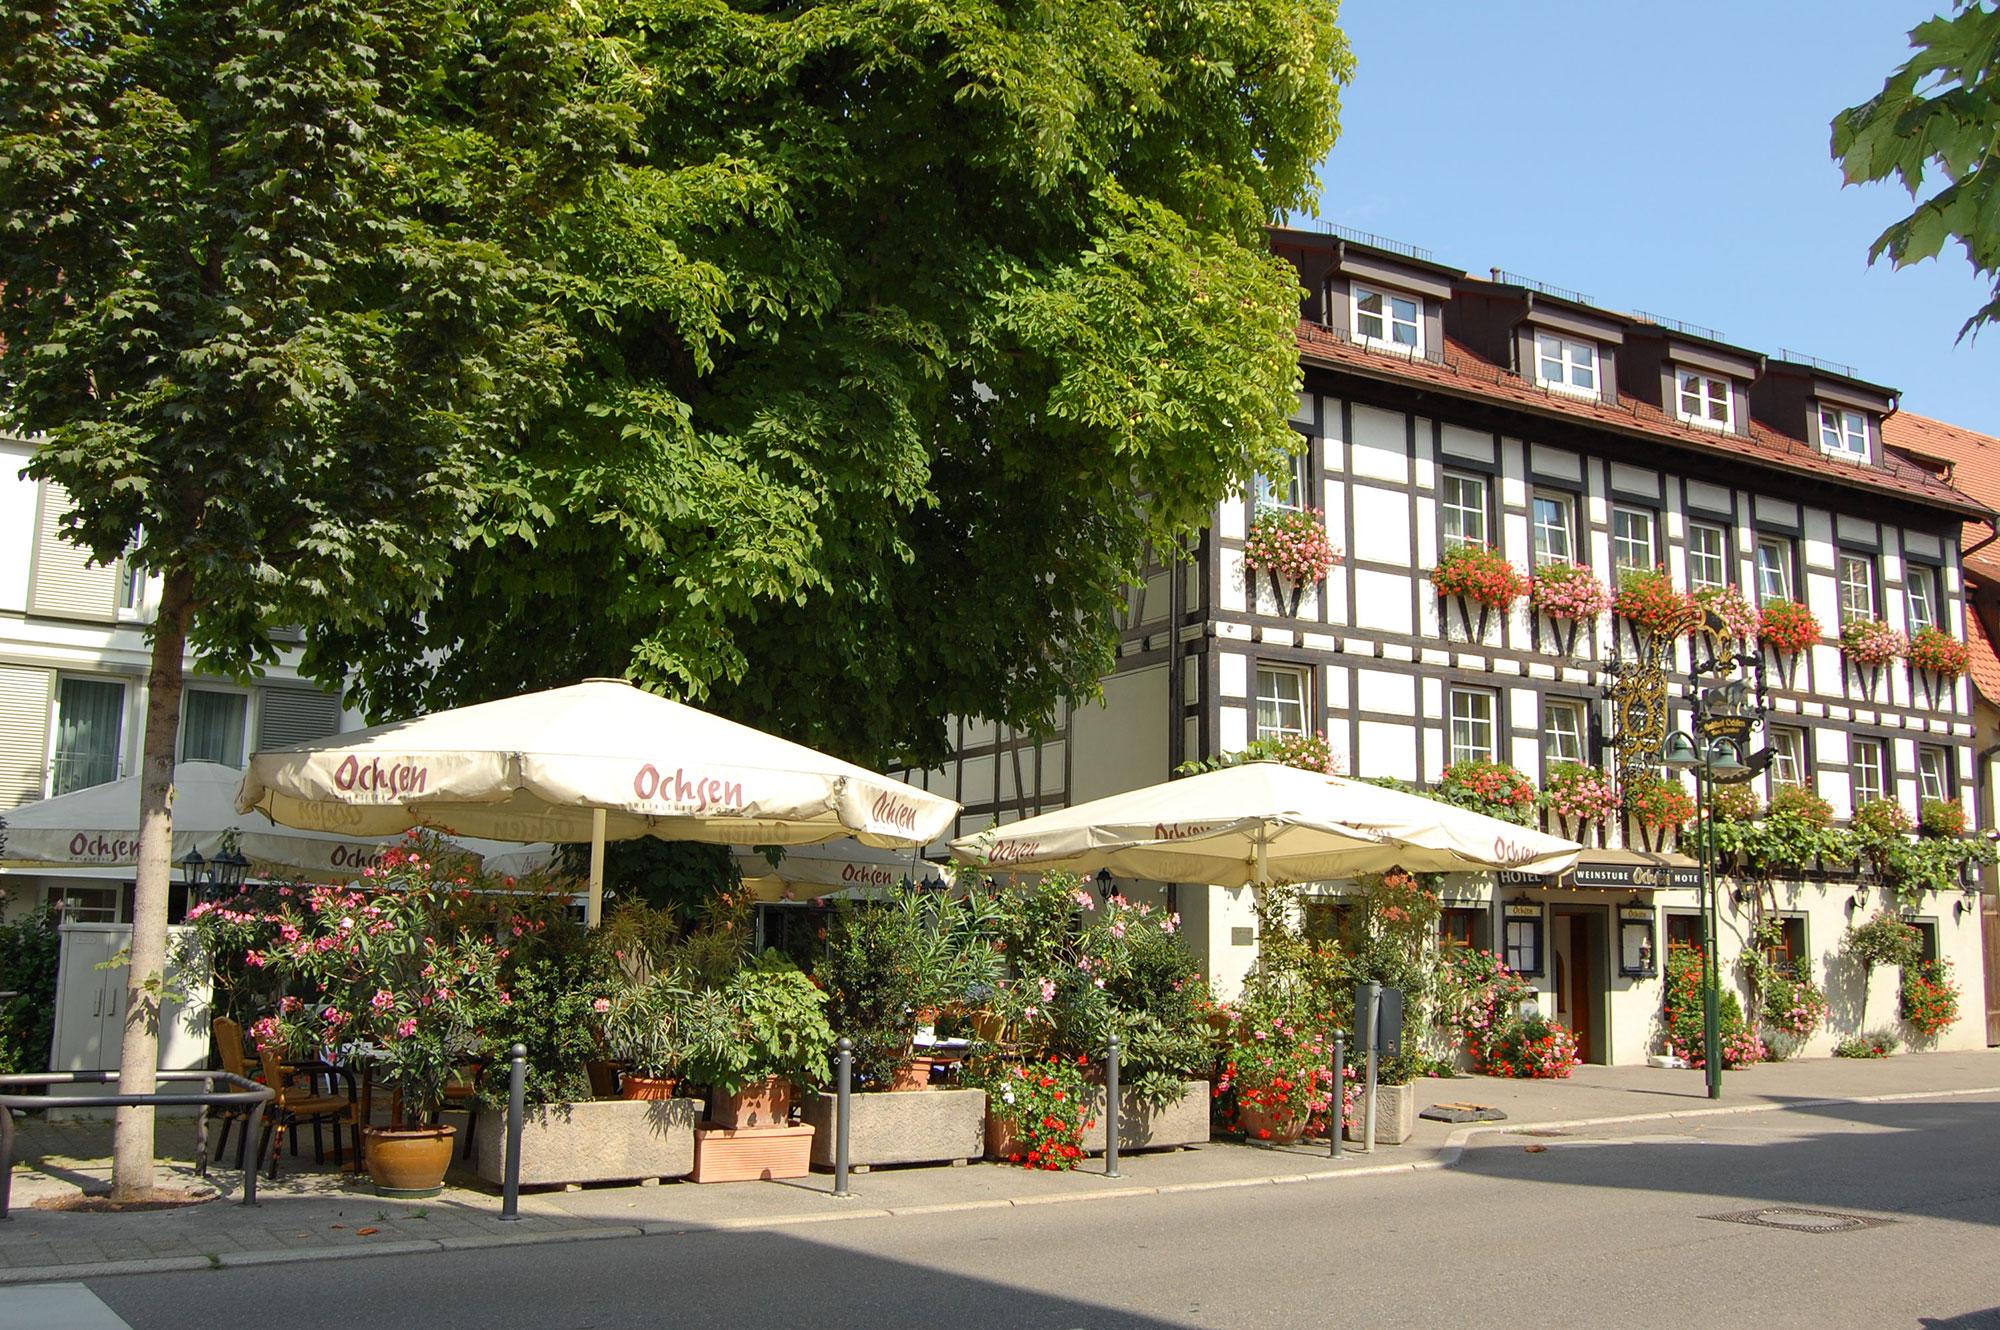 Hotel Ochsen Stuttgart Aussenansicht